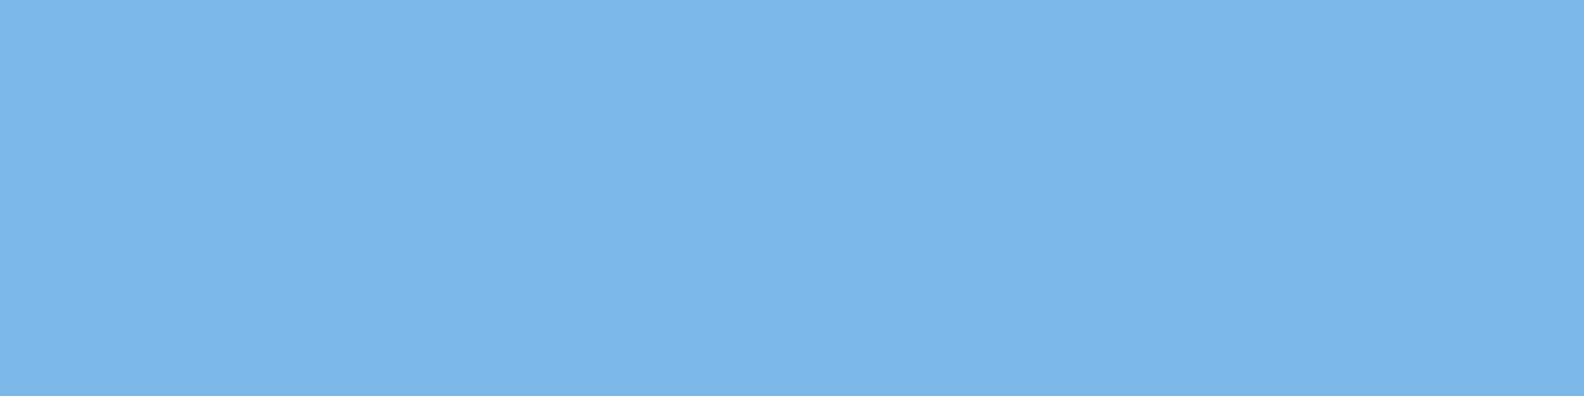 1584x396 Aero Solid Color Background